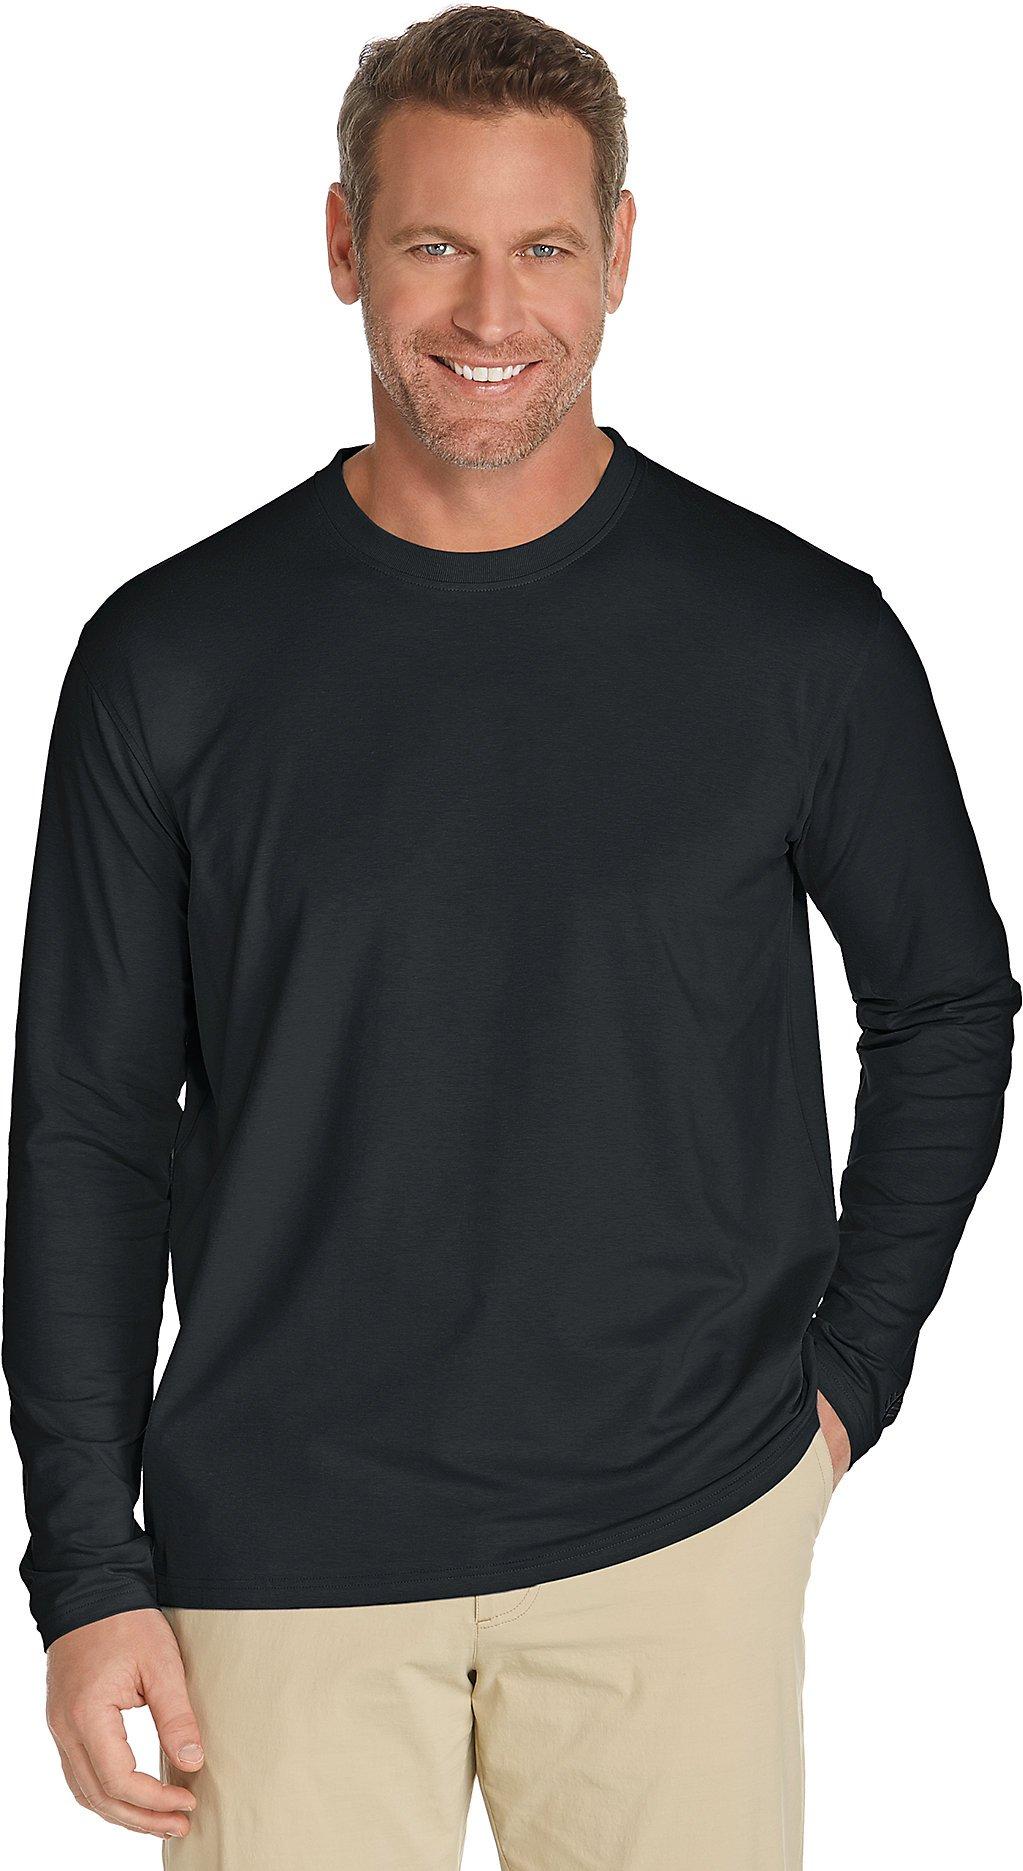 Coolibar UPF 50+ Men's Long Sleeve Everyday T-Shirt - Sun Protective (XX-Large- Black)